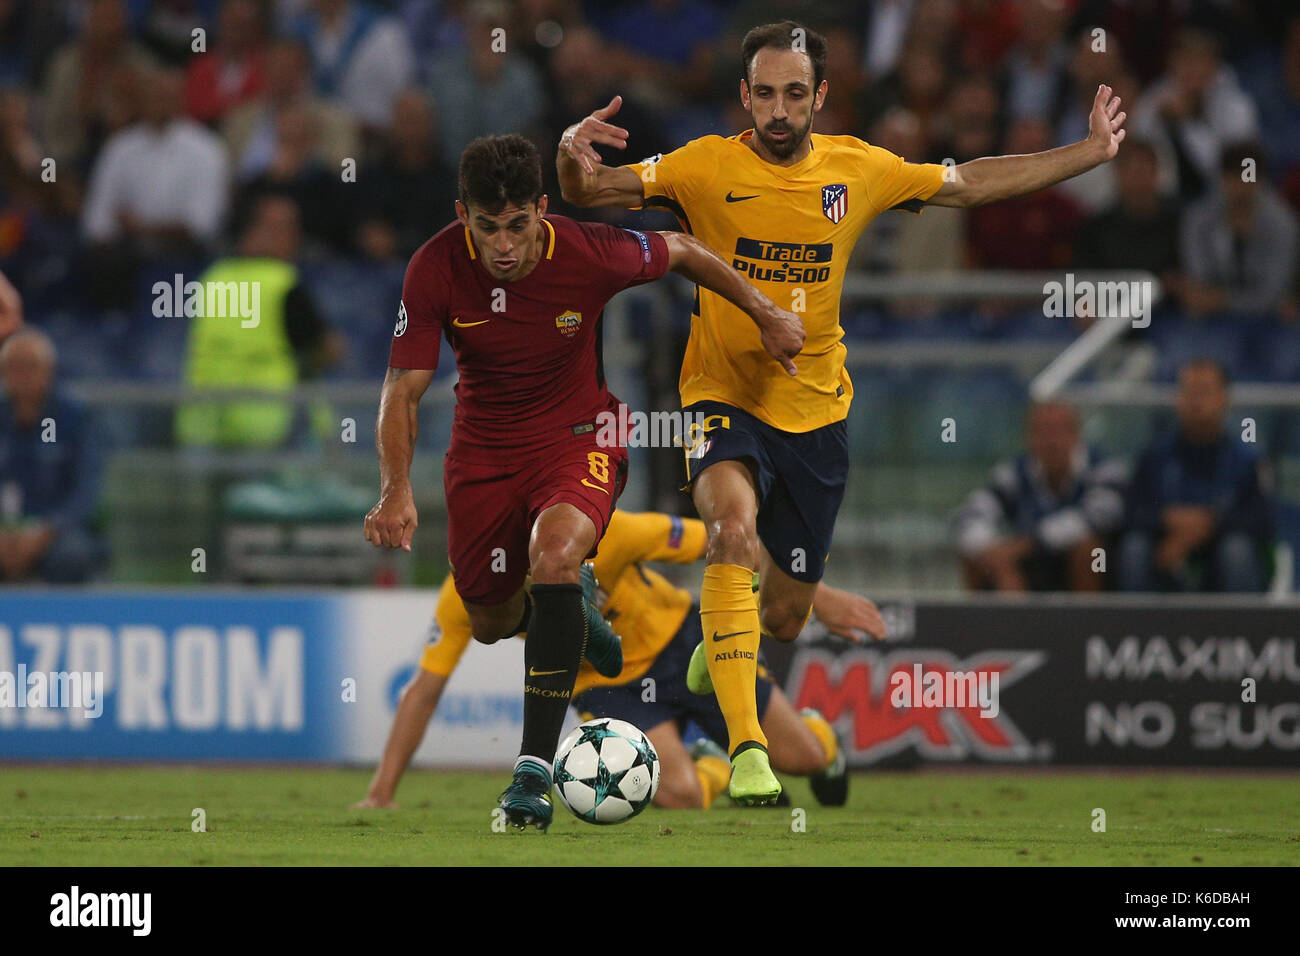 ROME, ITALY . 12 september 2017. Olimpic Stadium. UEFA CHAMPIONS LEAGUE 2017/2018. MATCH AS ROMA VS ATLETICO MADRID. Stock Photo